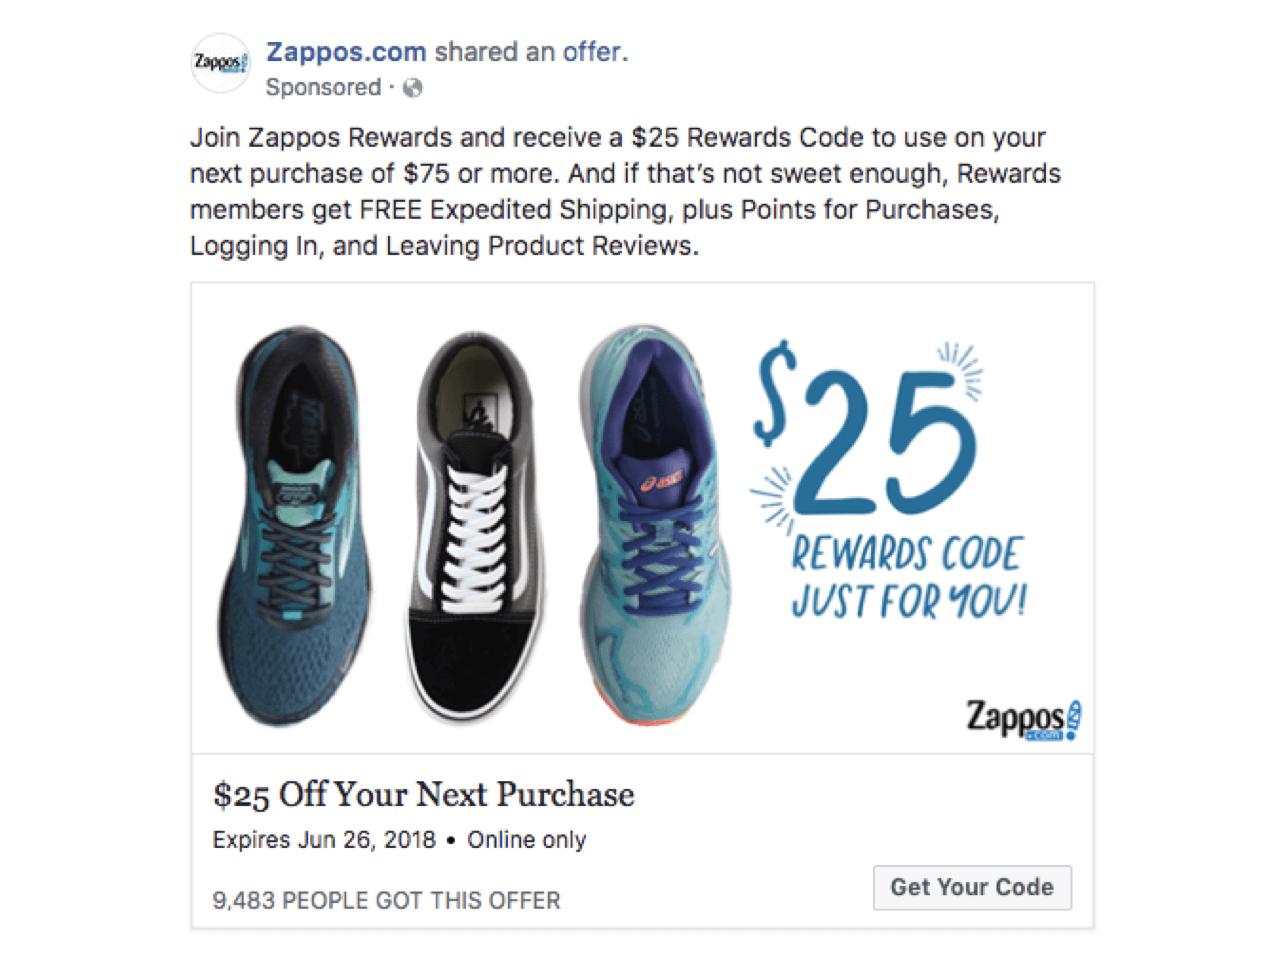 Zappos use coupon marketing to convert their social media followers